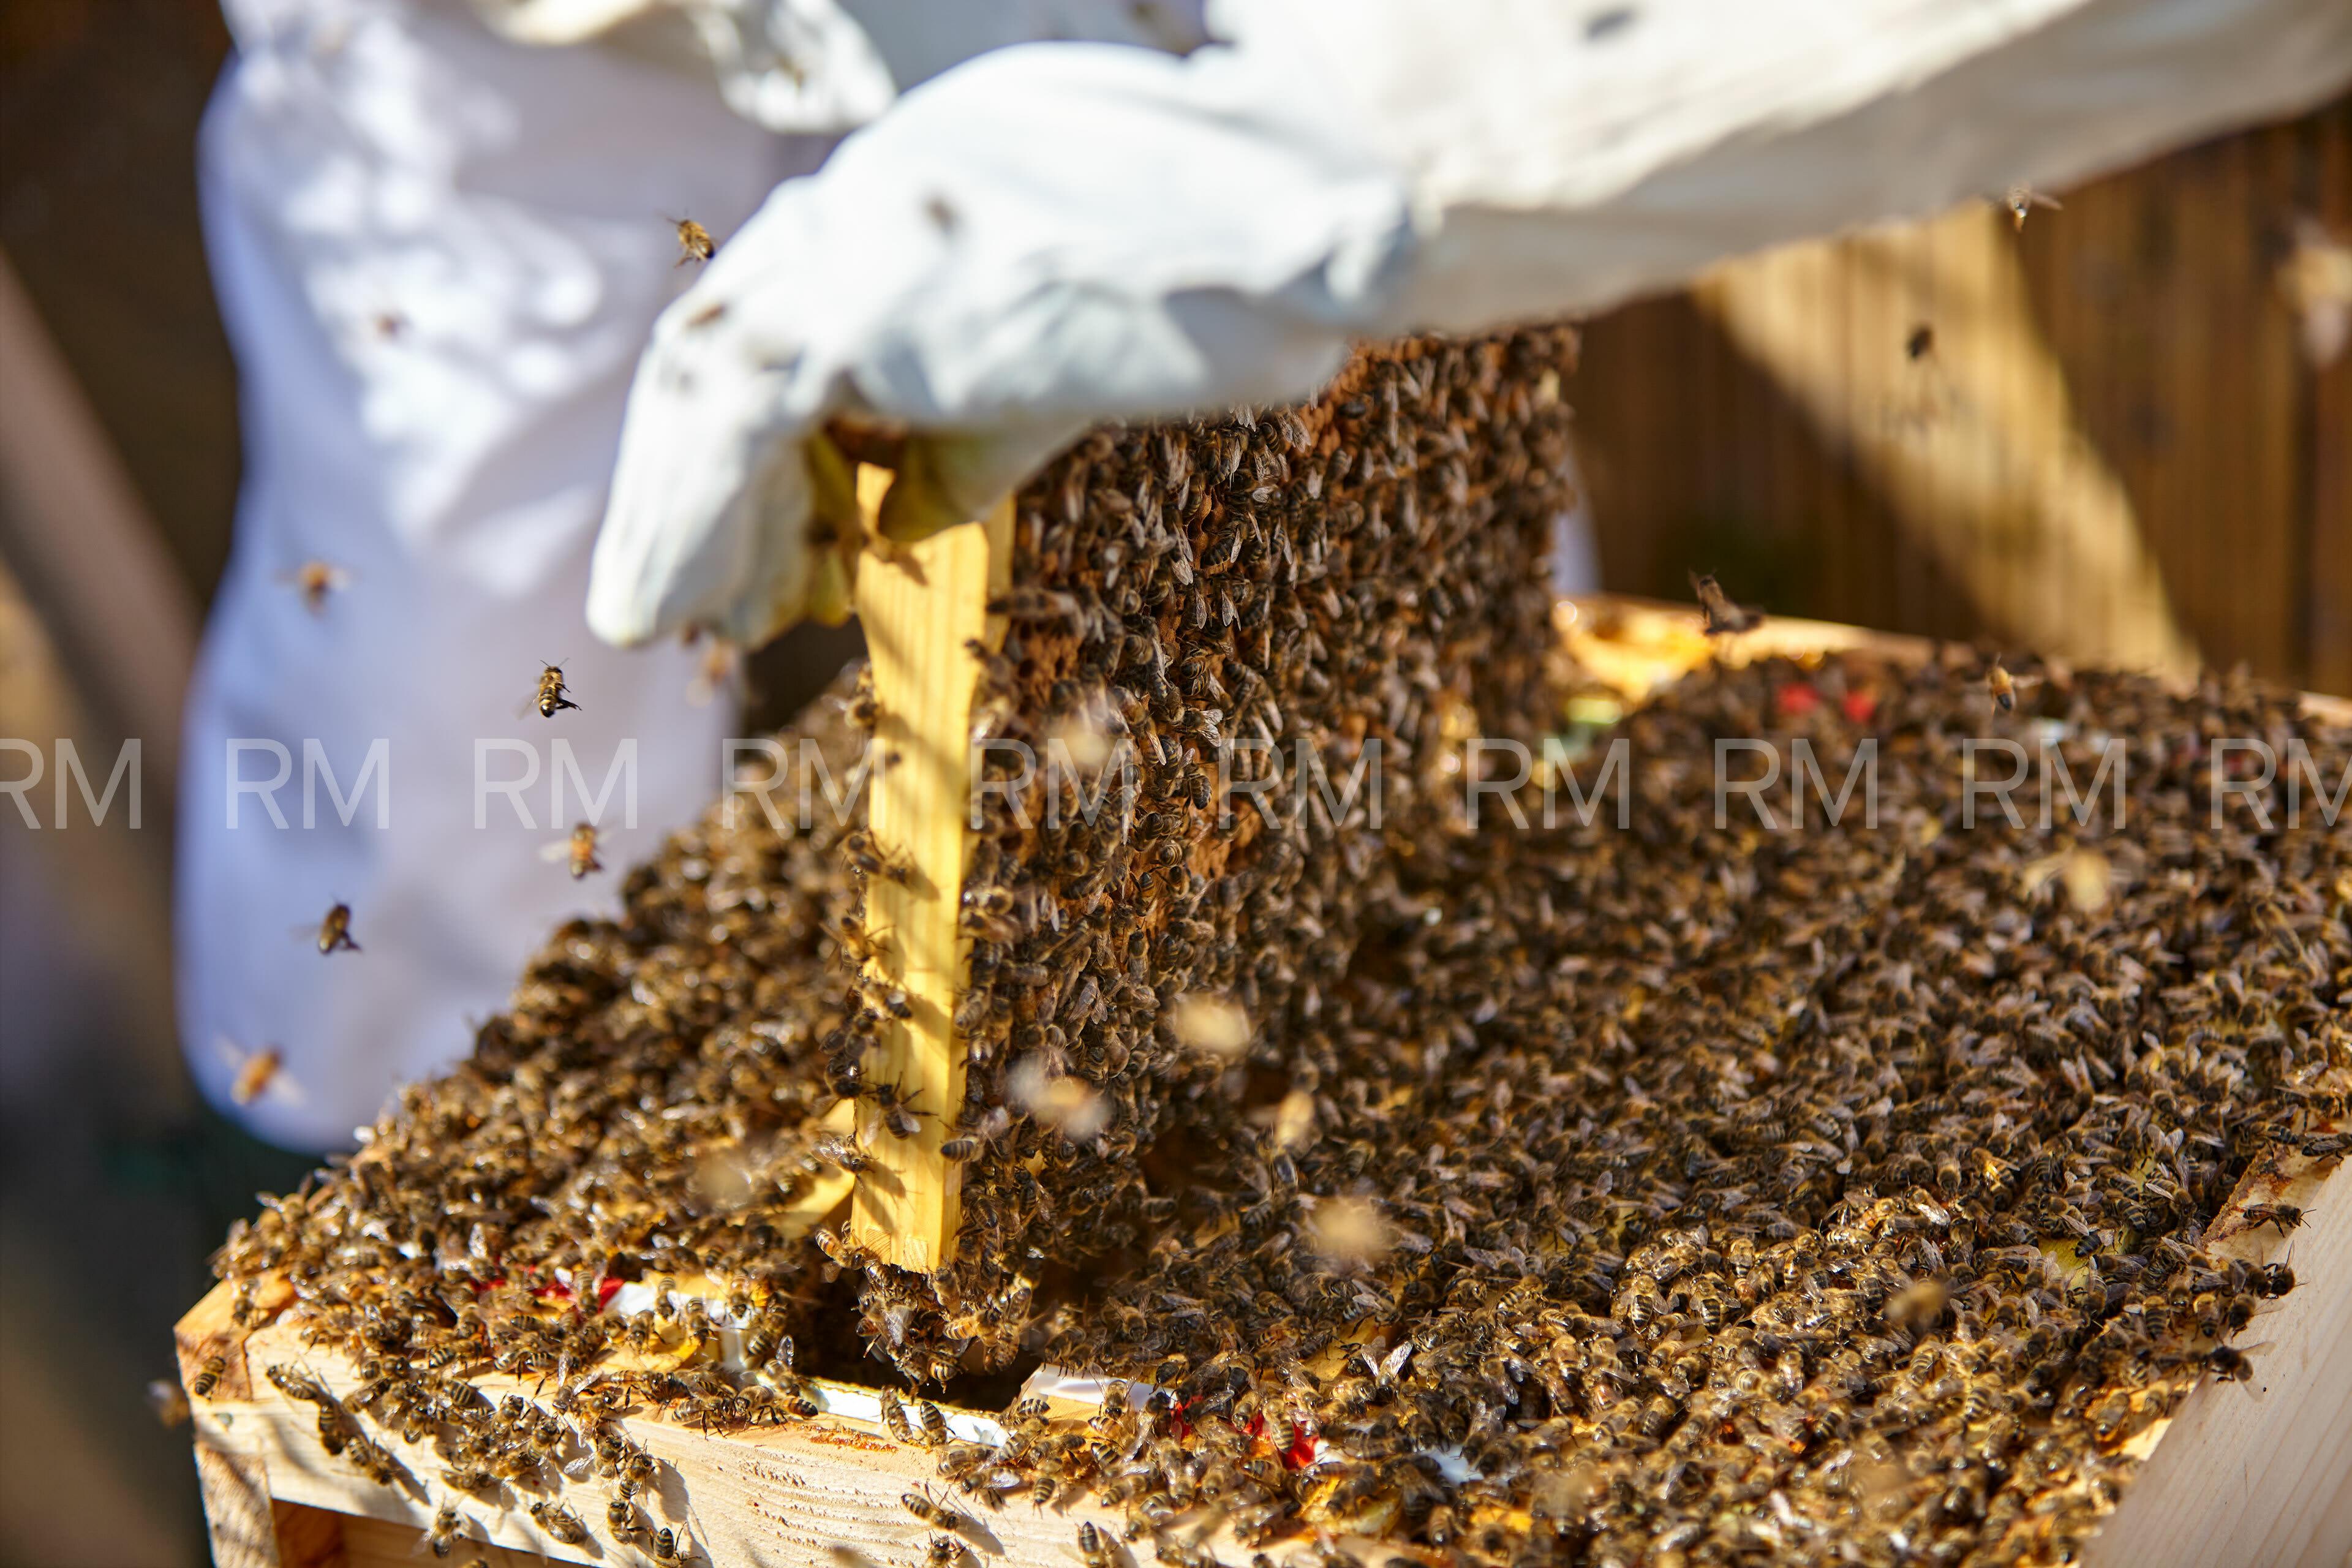 Richard Moran Bees 004